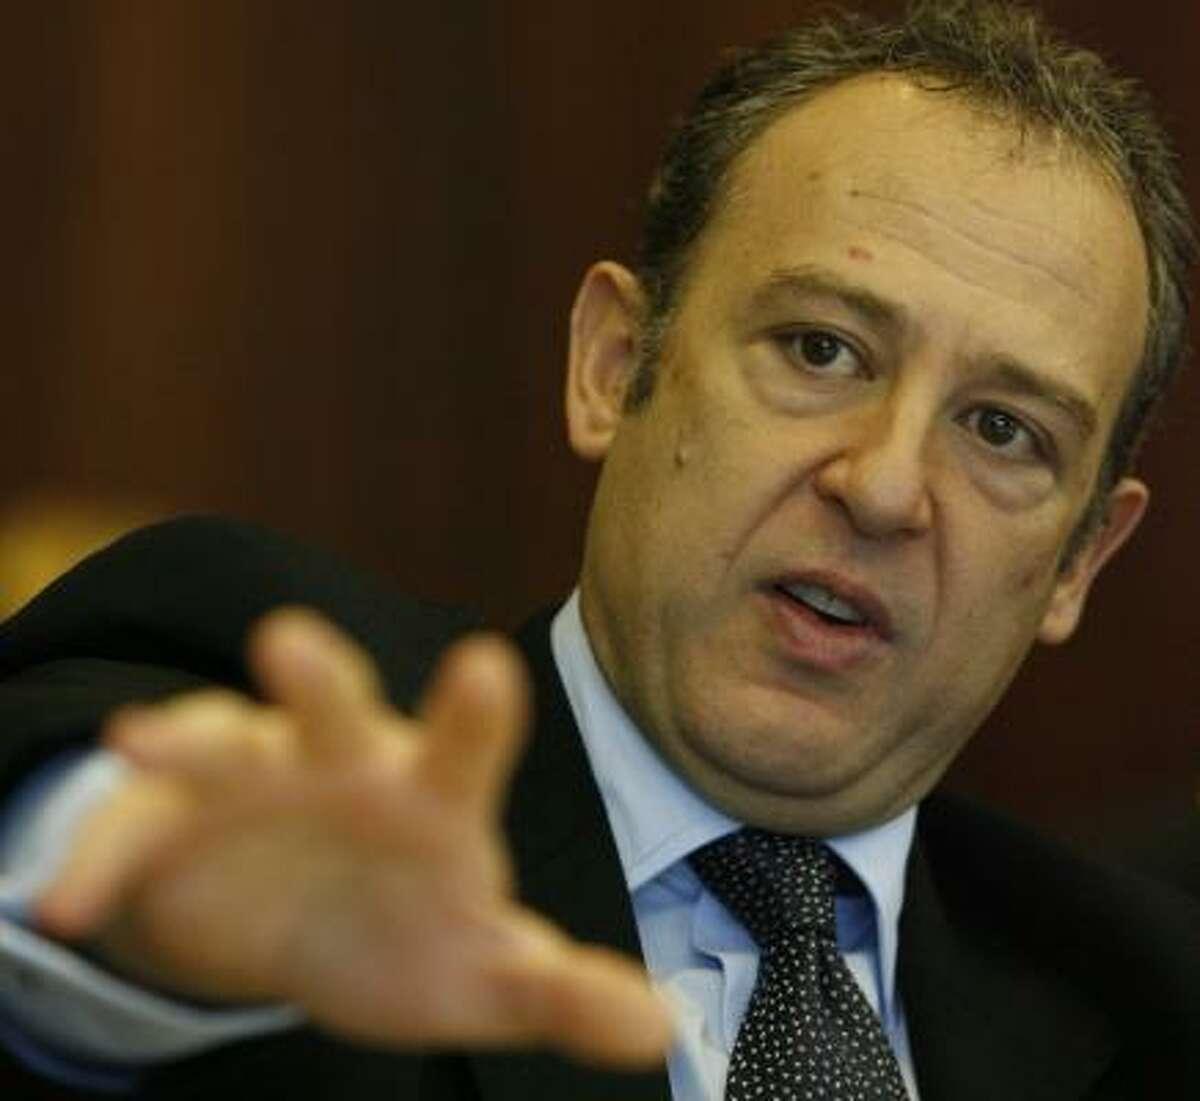 Ambassador Arturo Sarukhan says opening NAFTA to new talks could wreck it.